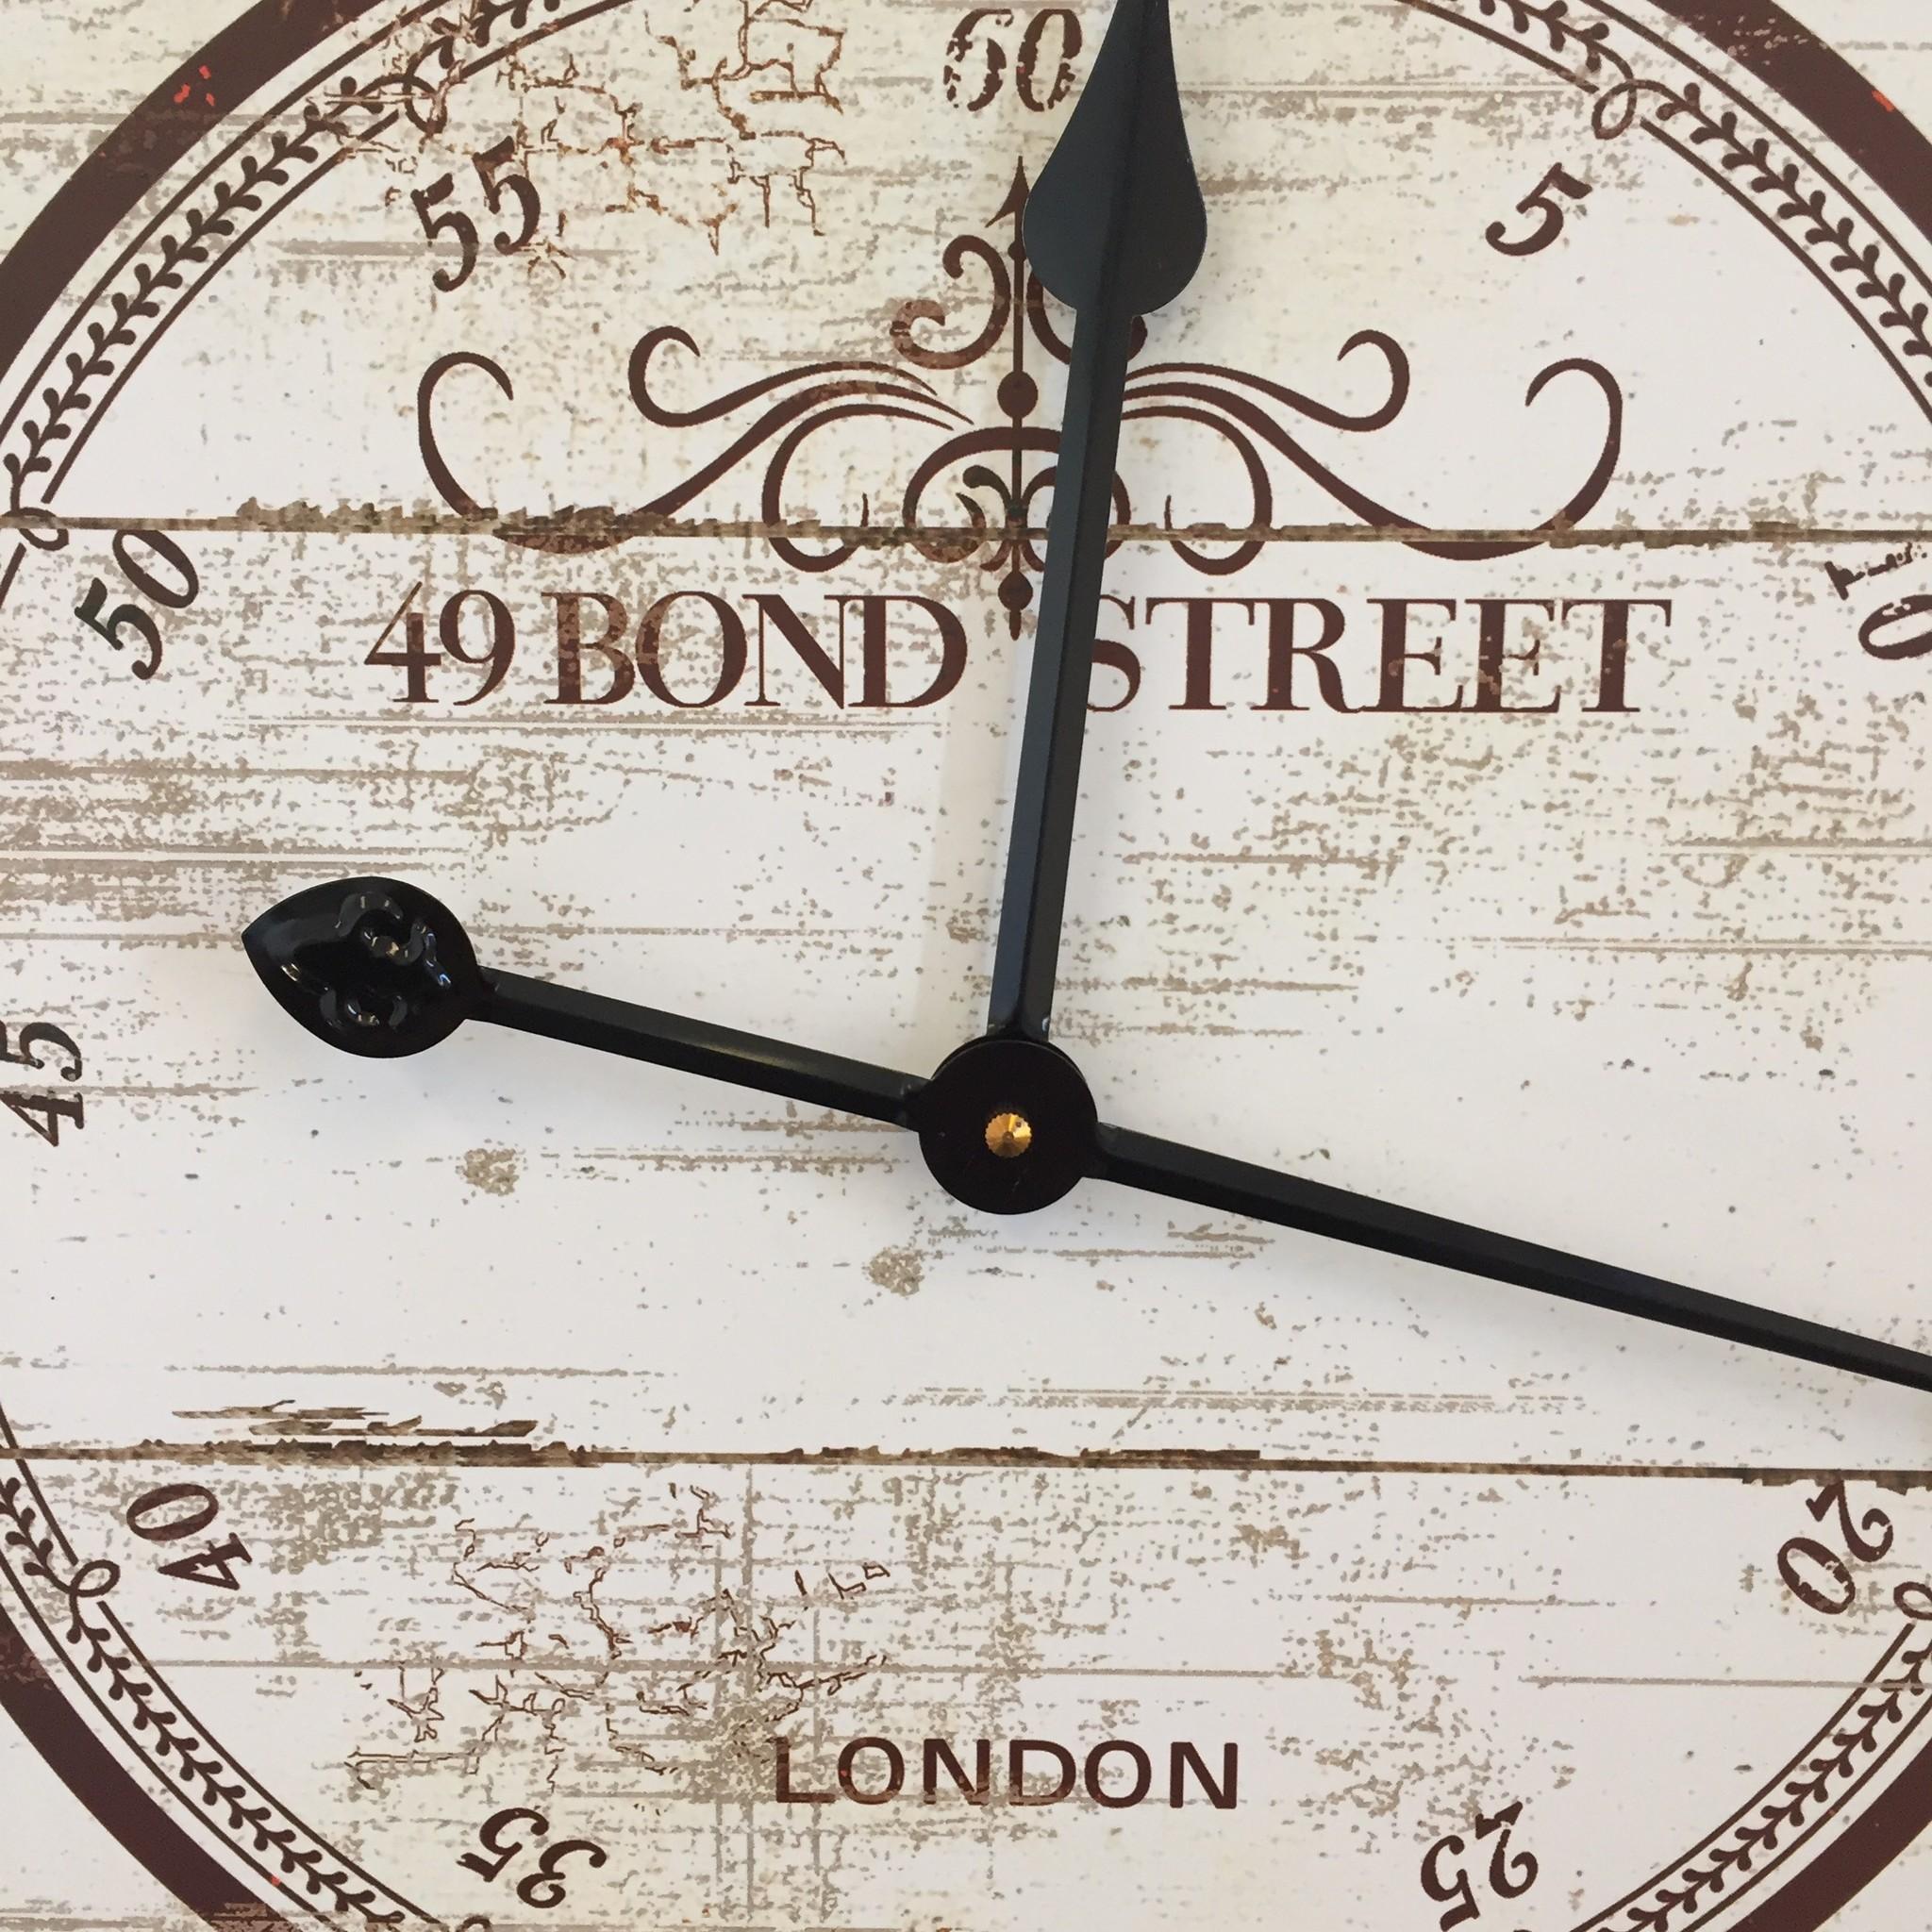 NiceTime Wandklok Bondstreet 49 Industrieel Design